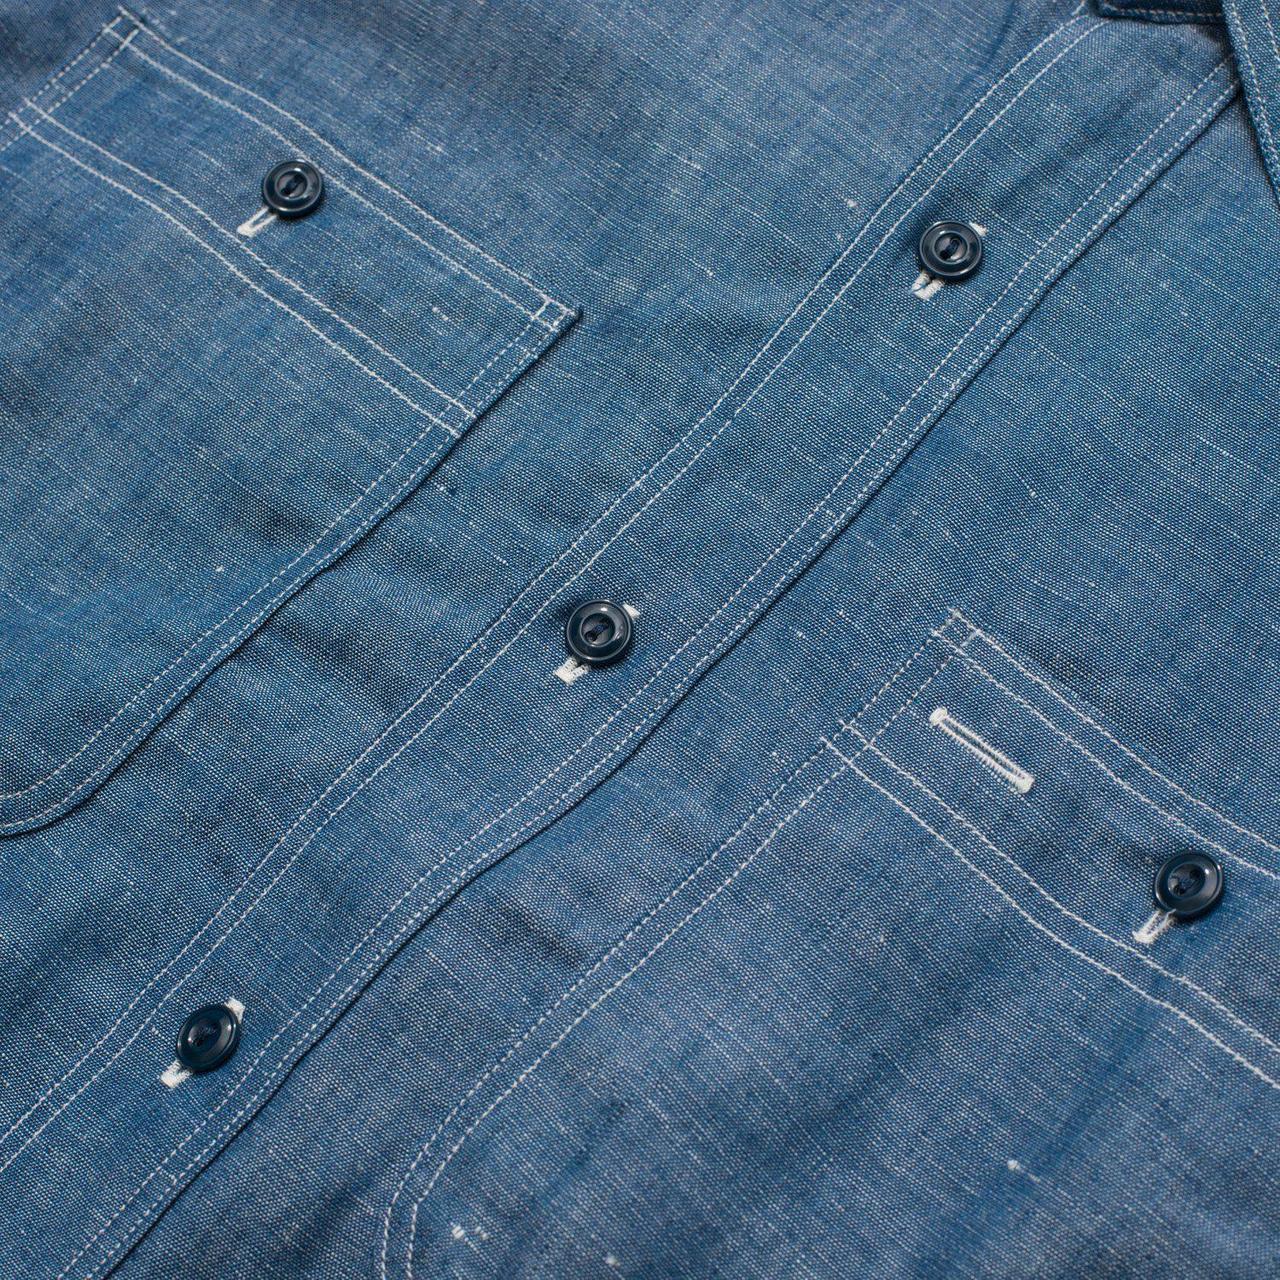 Belafonte 16-025 BRagtime Chopper Collar Shirt Chambray-Shirts-Clutch Cafe